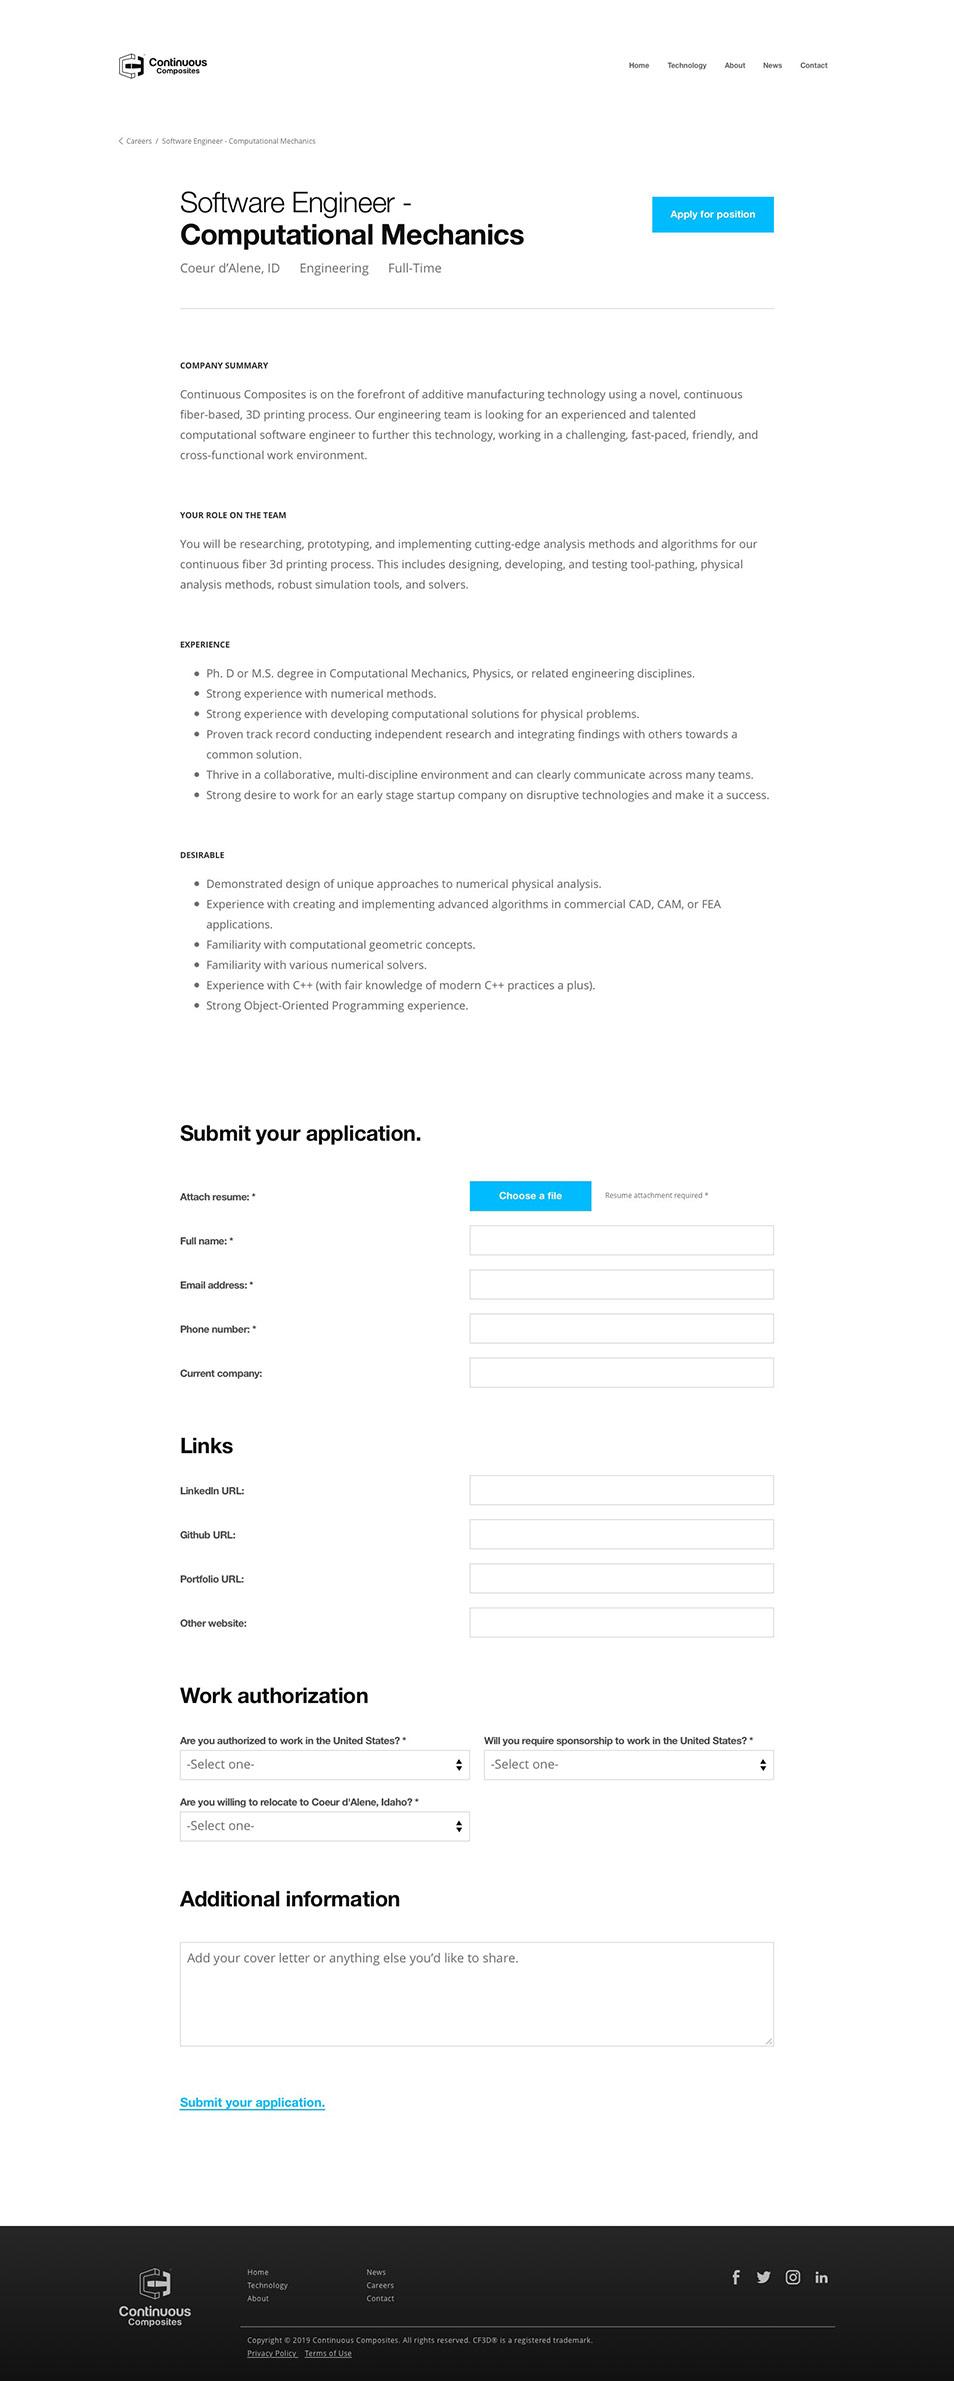 Desktop view of jobs details page